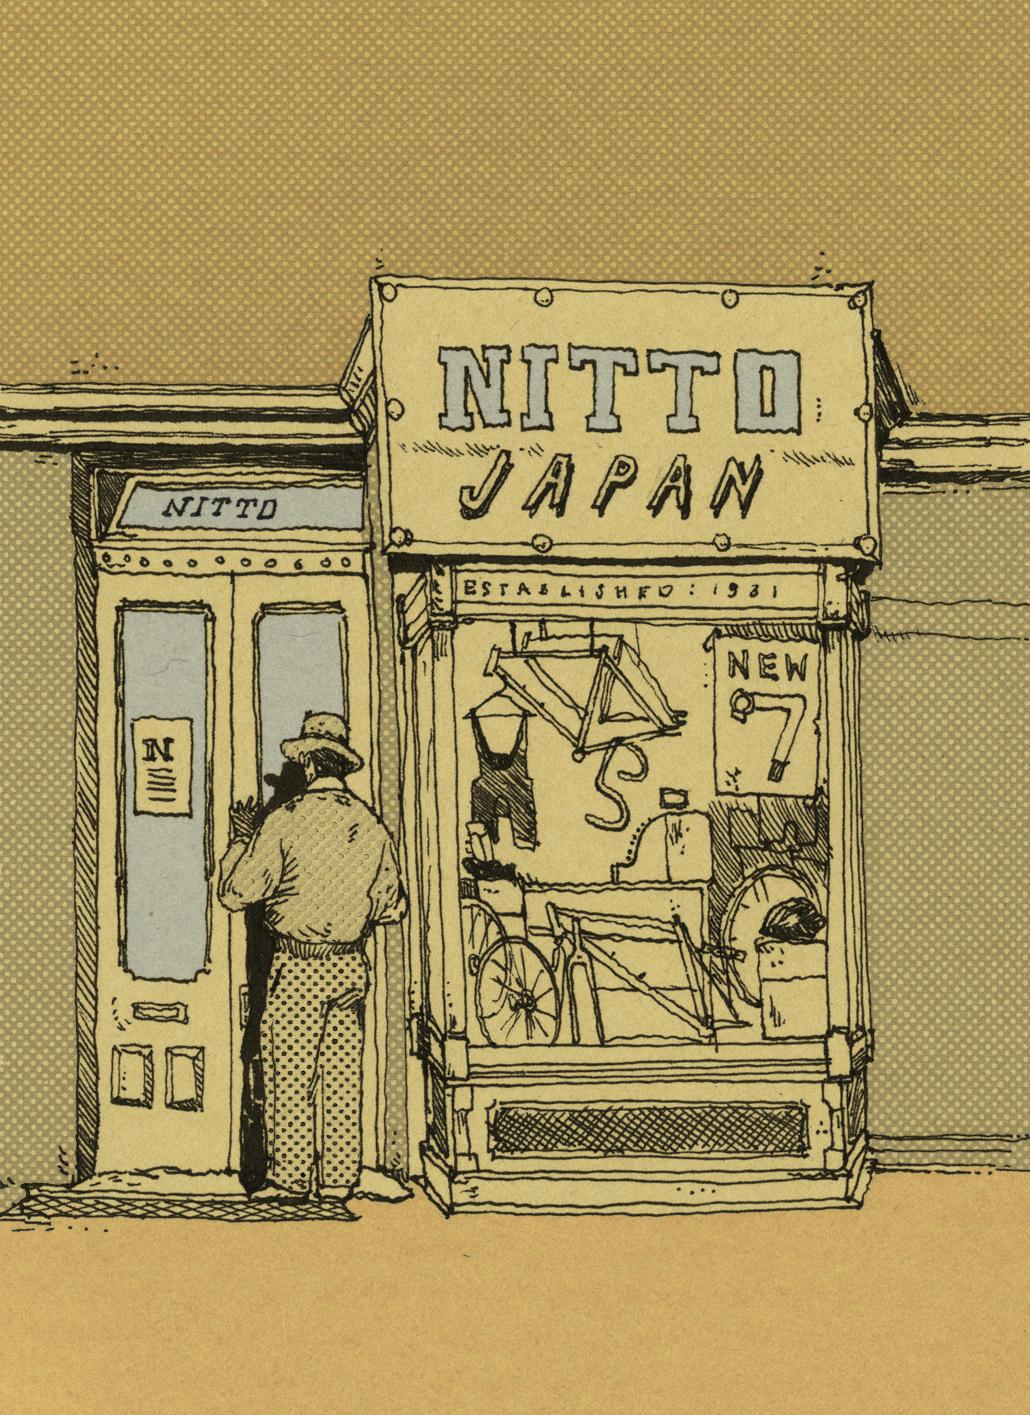 Nitto Shop Japan